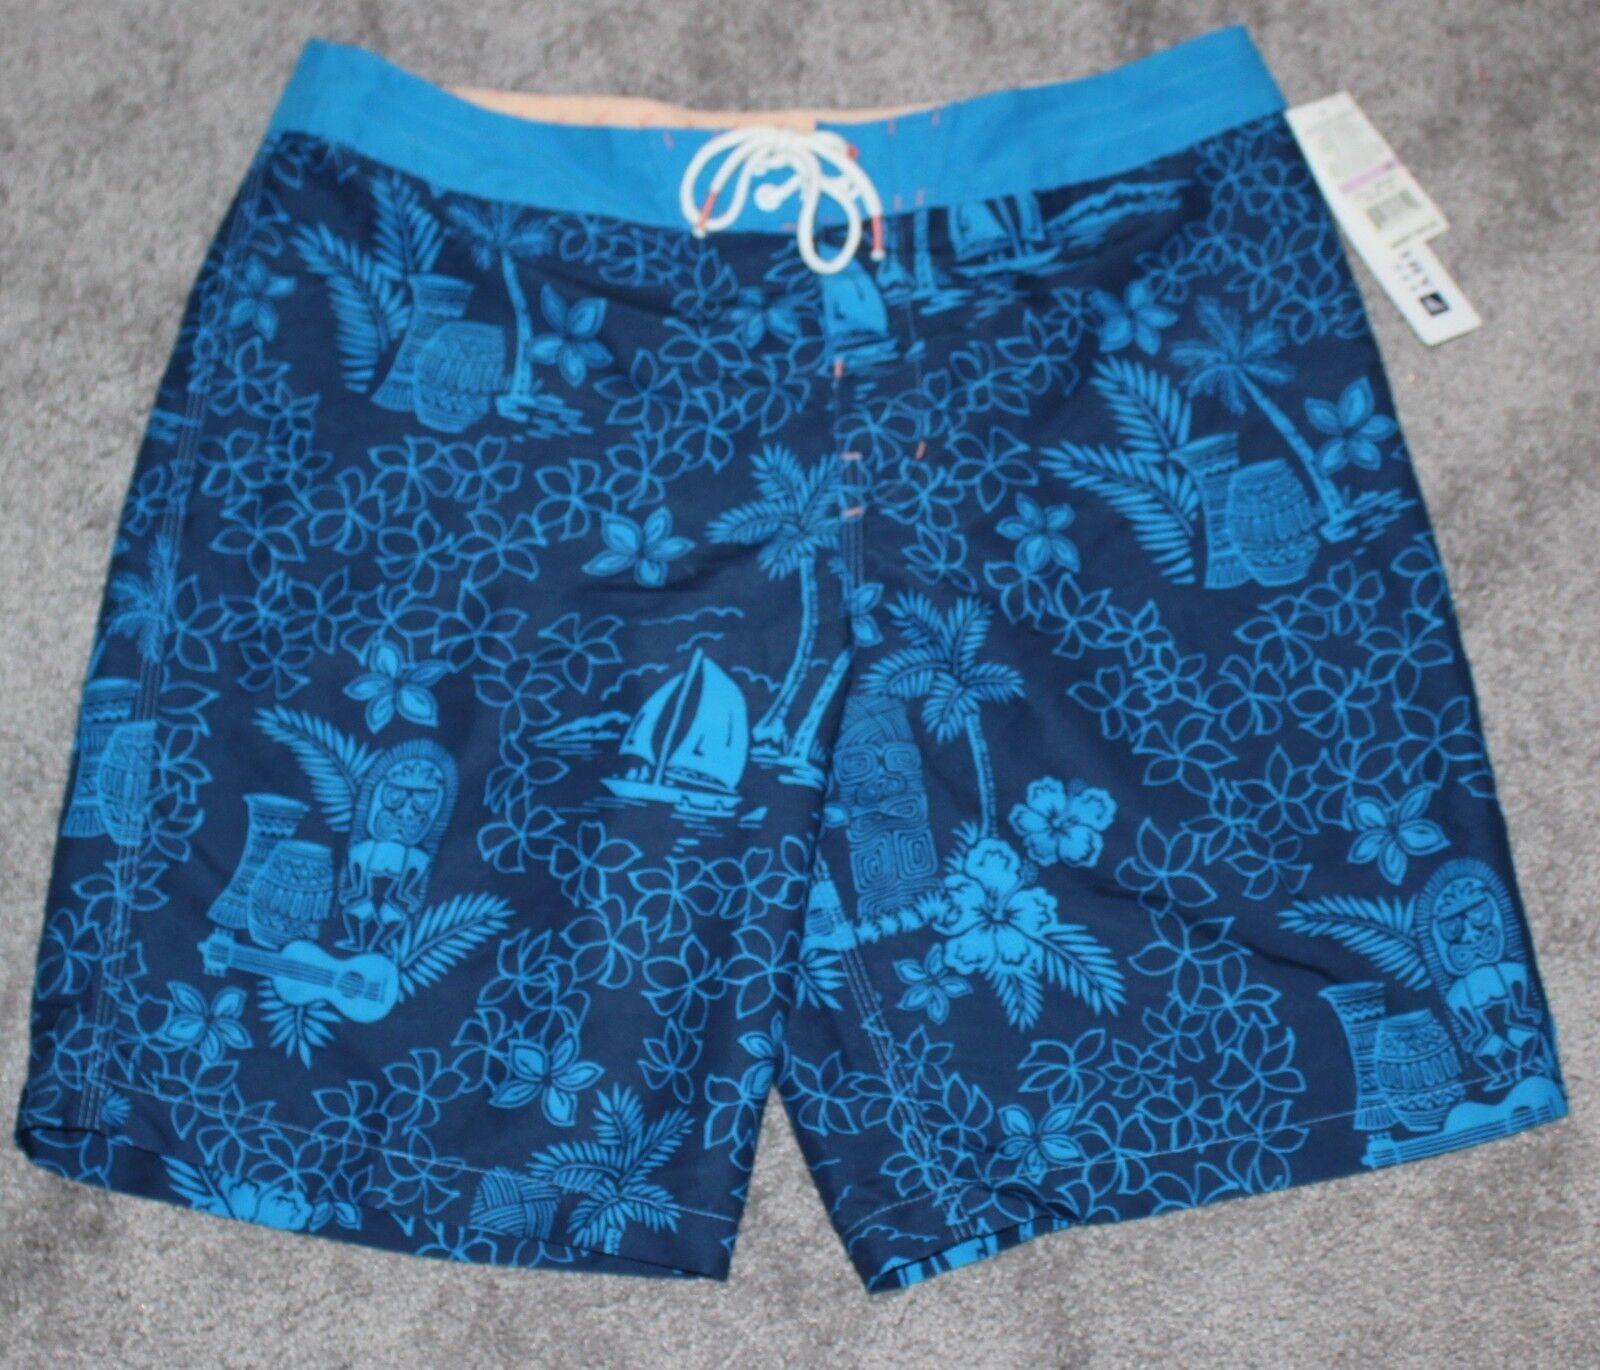 New SPERRY Board Shorts Tiki Hawaiian Swimsuit Men's XL X-LARGE Navy bluee Floral